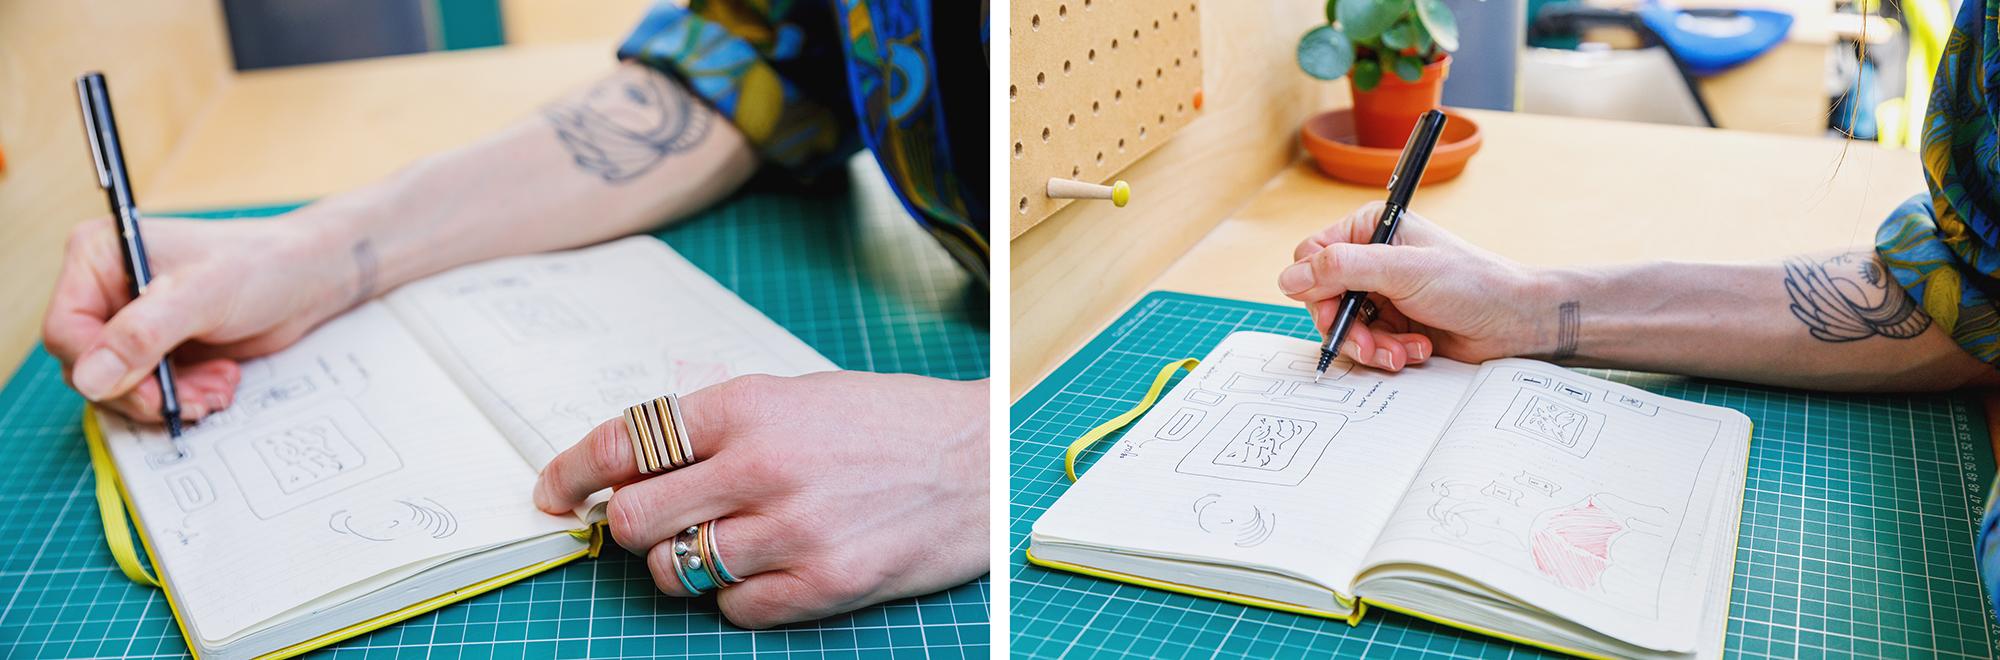 Claudia Kennaugh sketching ideas at Gather Round